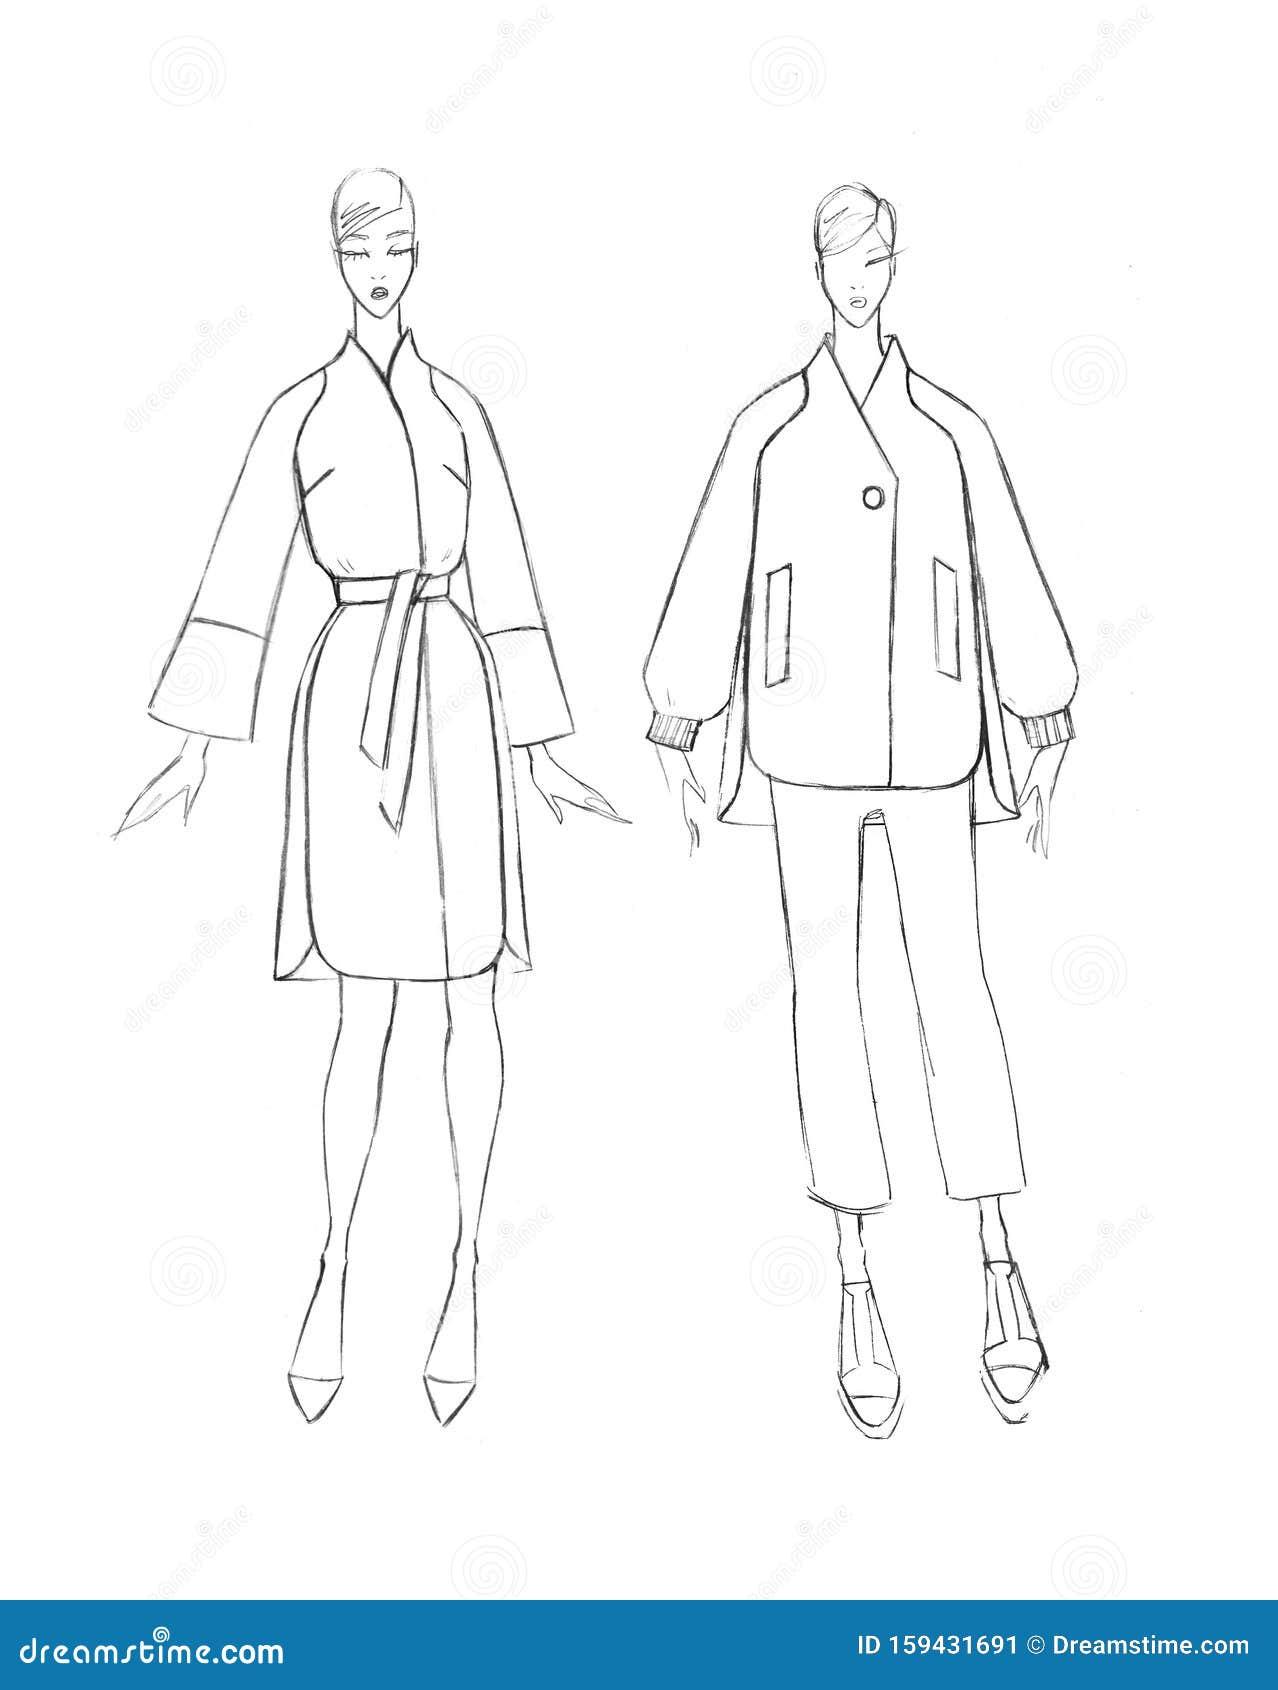 Sketch Of A Female Coat Set Fashion Design Stock Illustration Illustration Of Drawing Girl 159431691